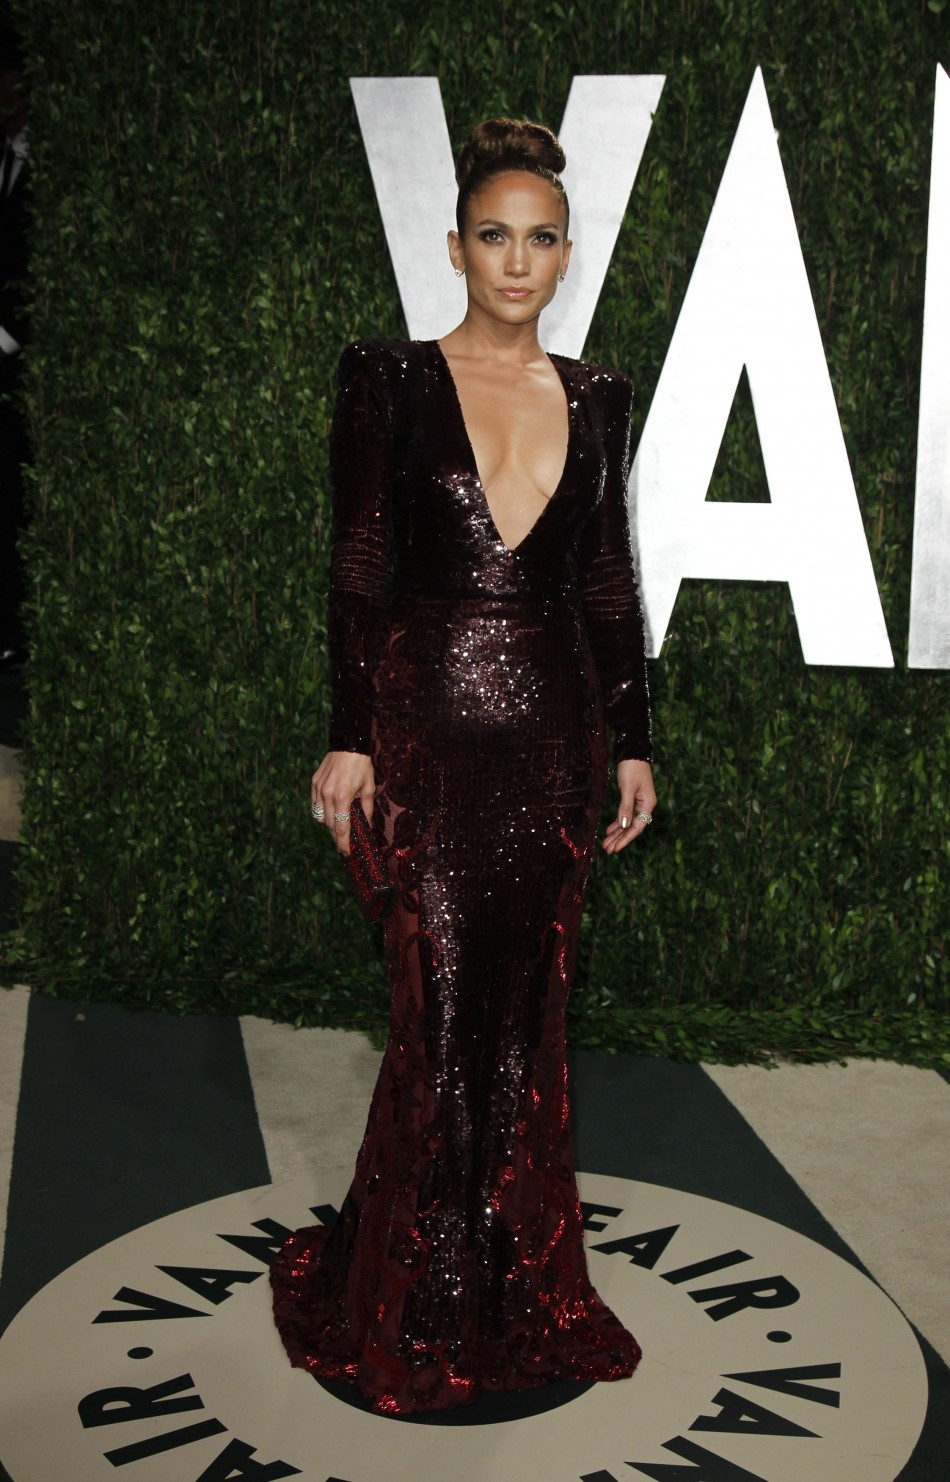 Oscars 2012 Vanity Fair After-Party